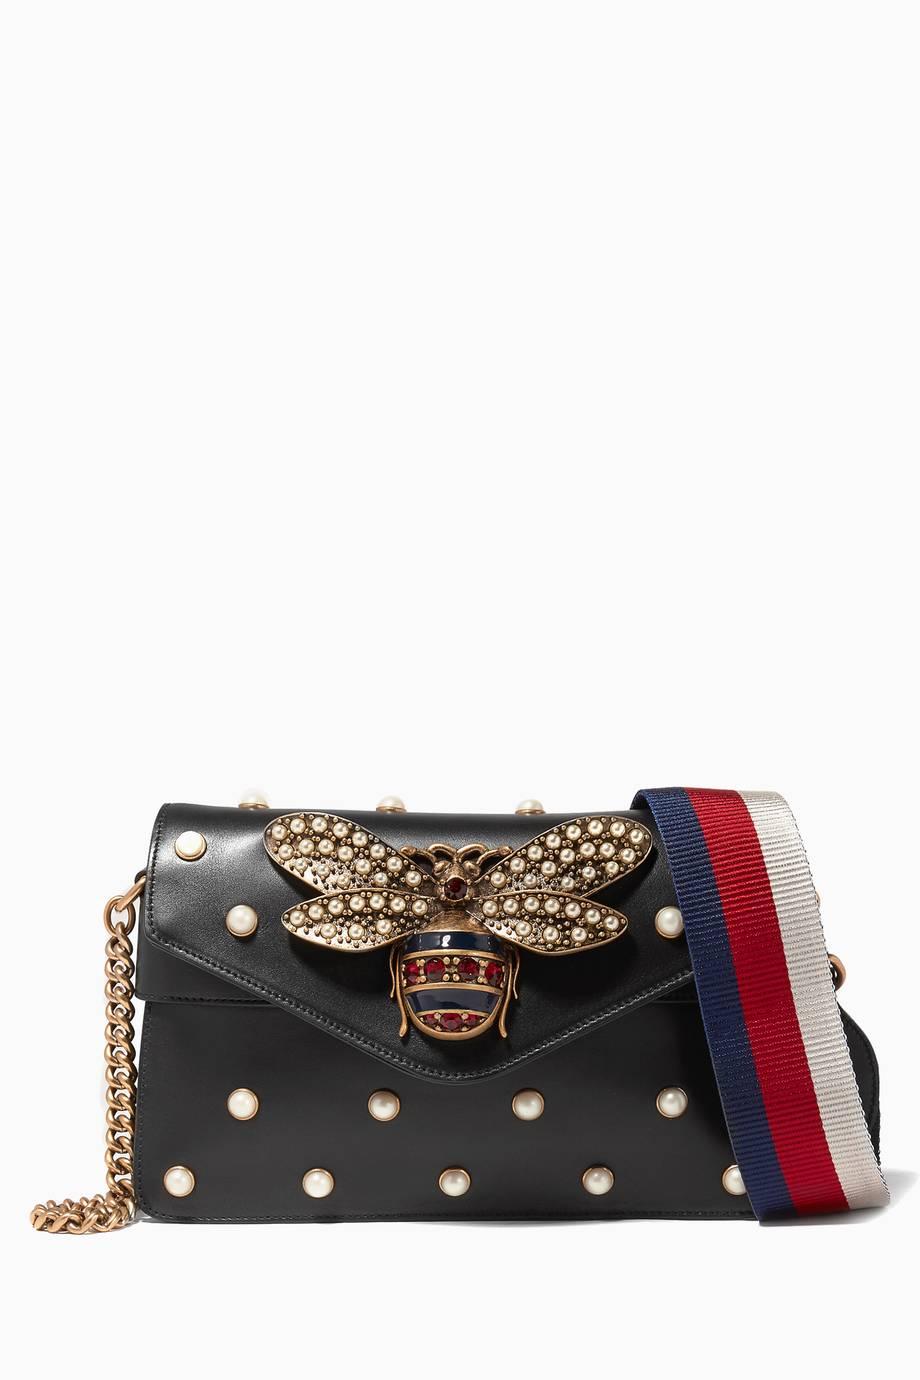 Shop Luxury Gucci Black Broadway Leather Chain Clutch  7fba4b0ae71b5